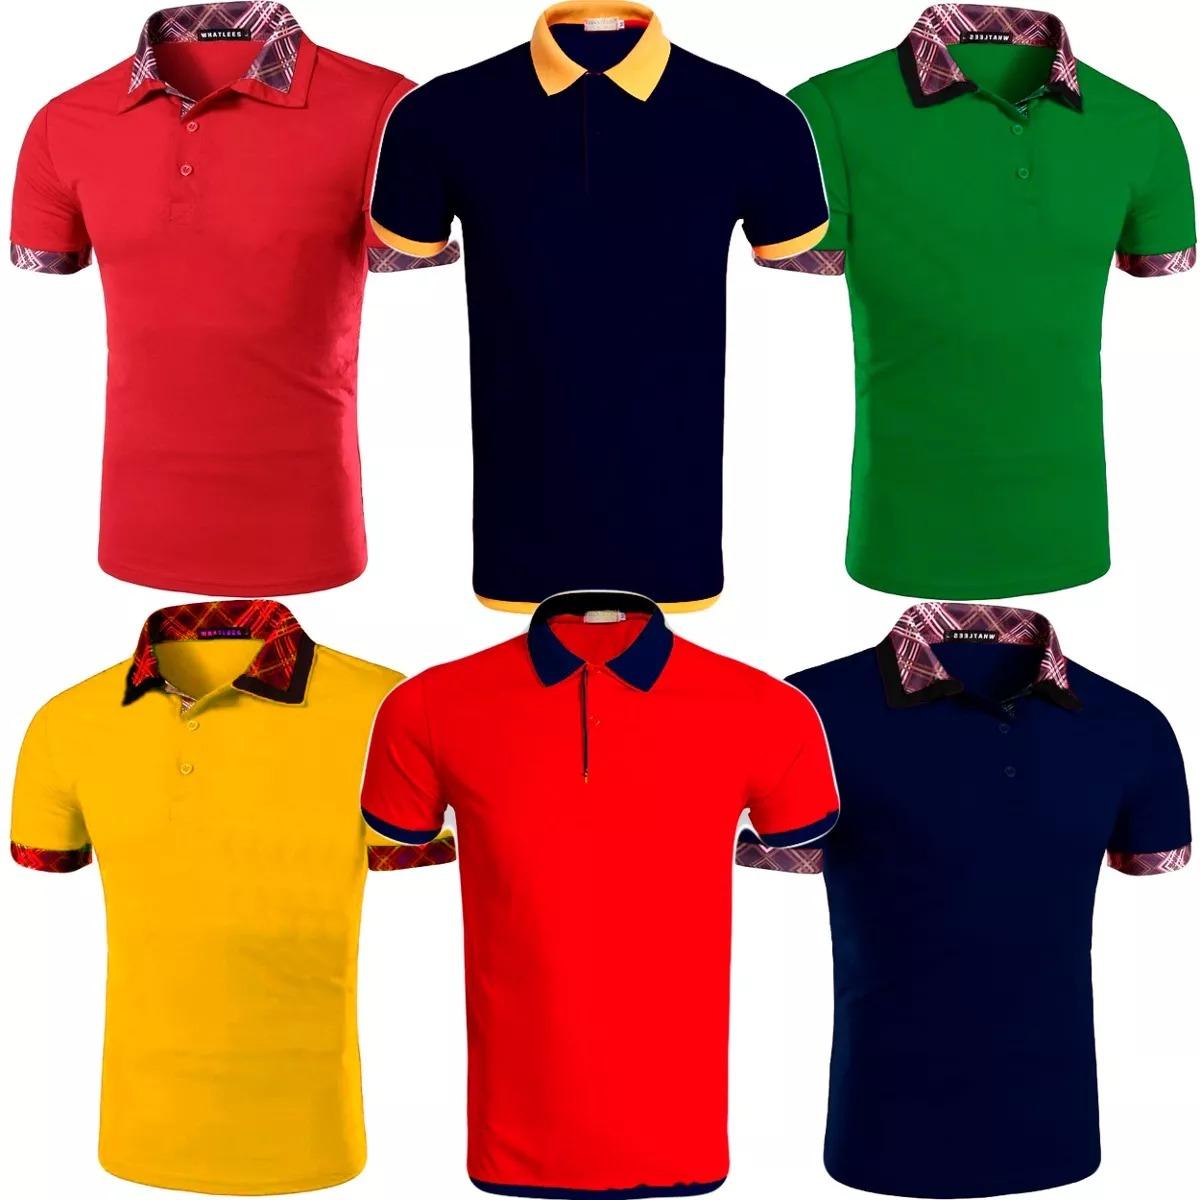 1bd180313ab9bb  kit 10 camisas polo masculina atacado blusas camiseta  barata. Carregando zoom. 8c23f03f08d78